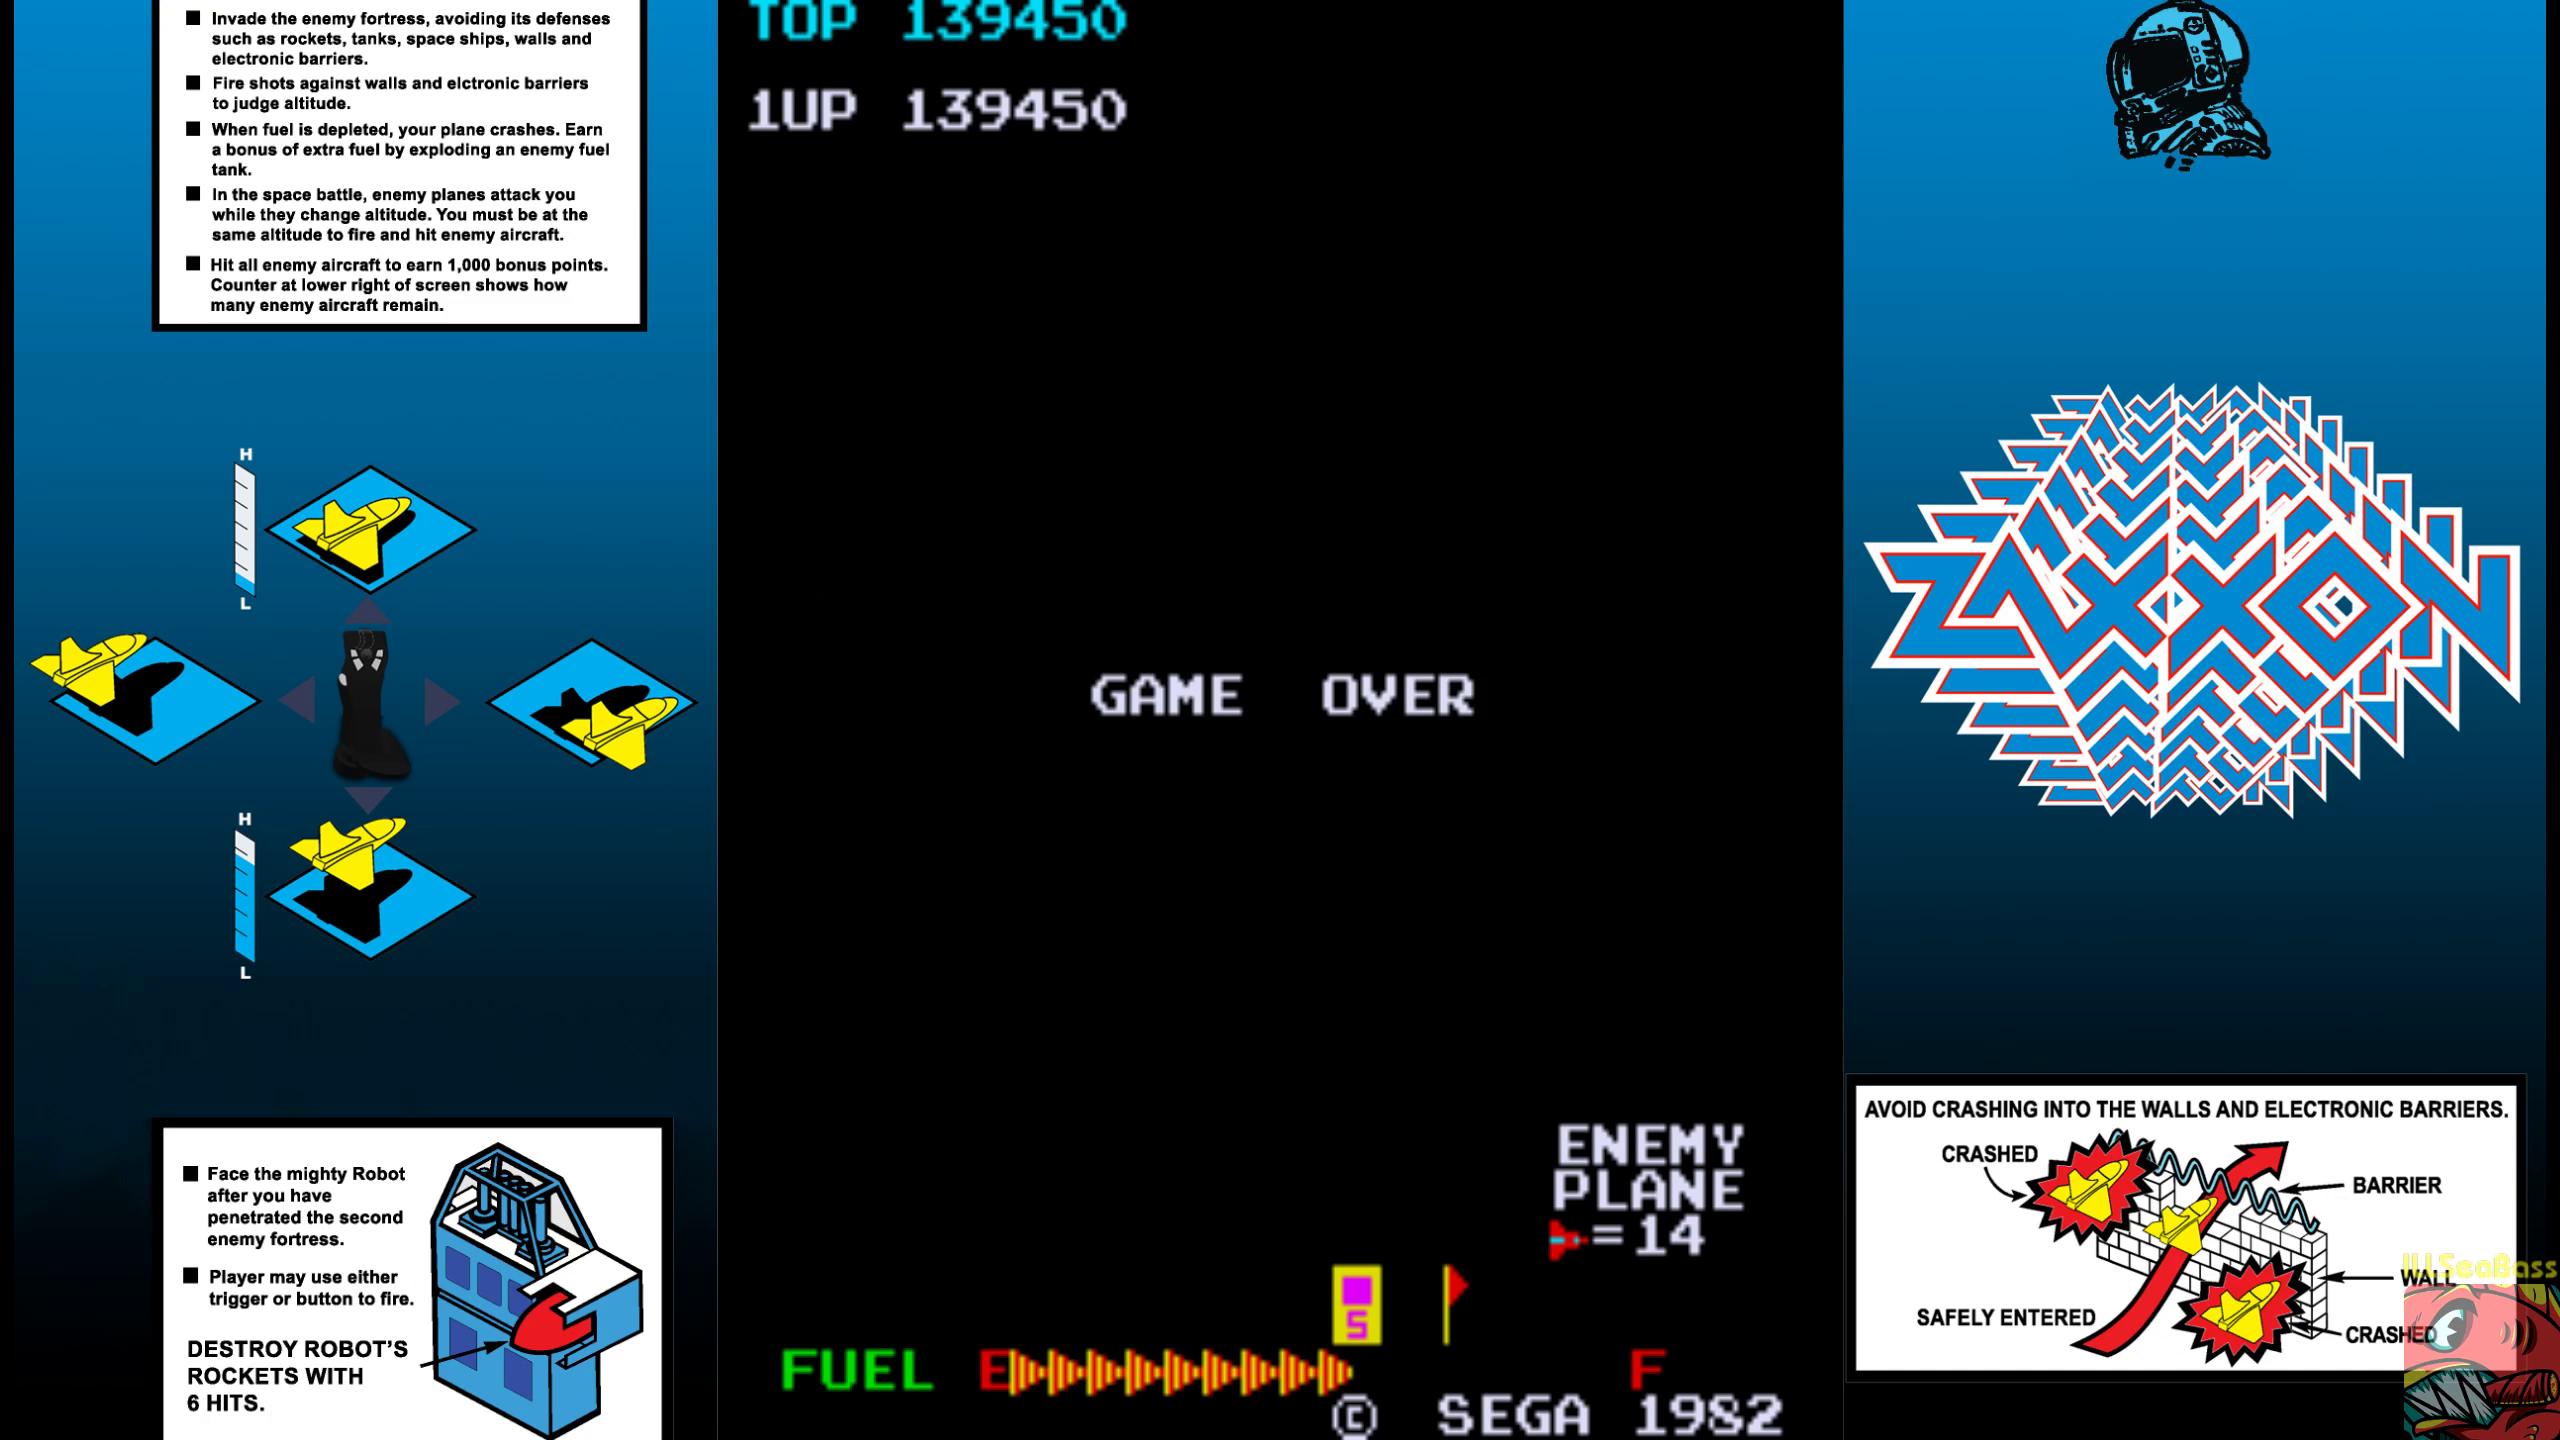 ILLSeaBass: Zaxxon (Arcade Emulated / M.A.M.E.) 139,450 points on 2019-10-03 22:07:19